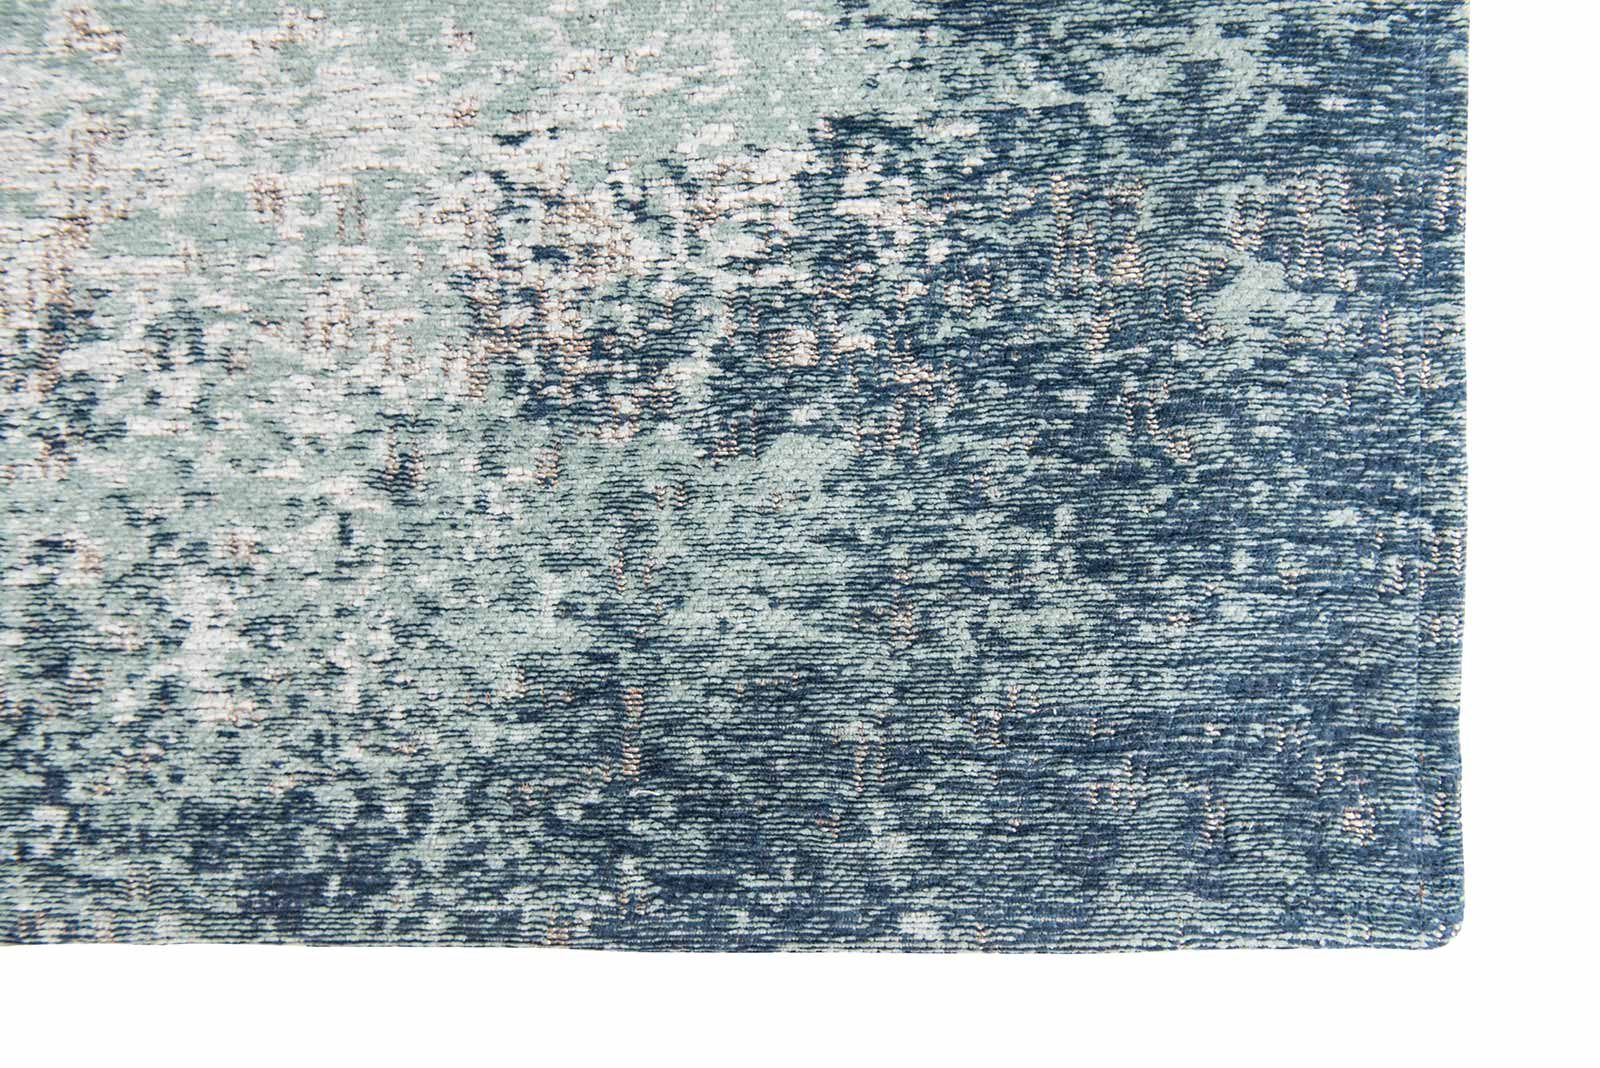 Louis De Poortere rugs Villa Nova LX 8769 Marka Teal corner